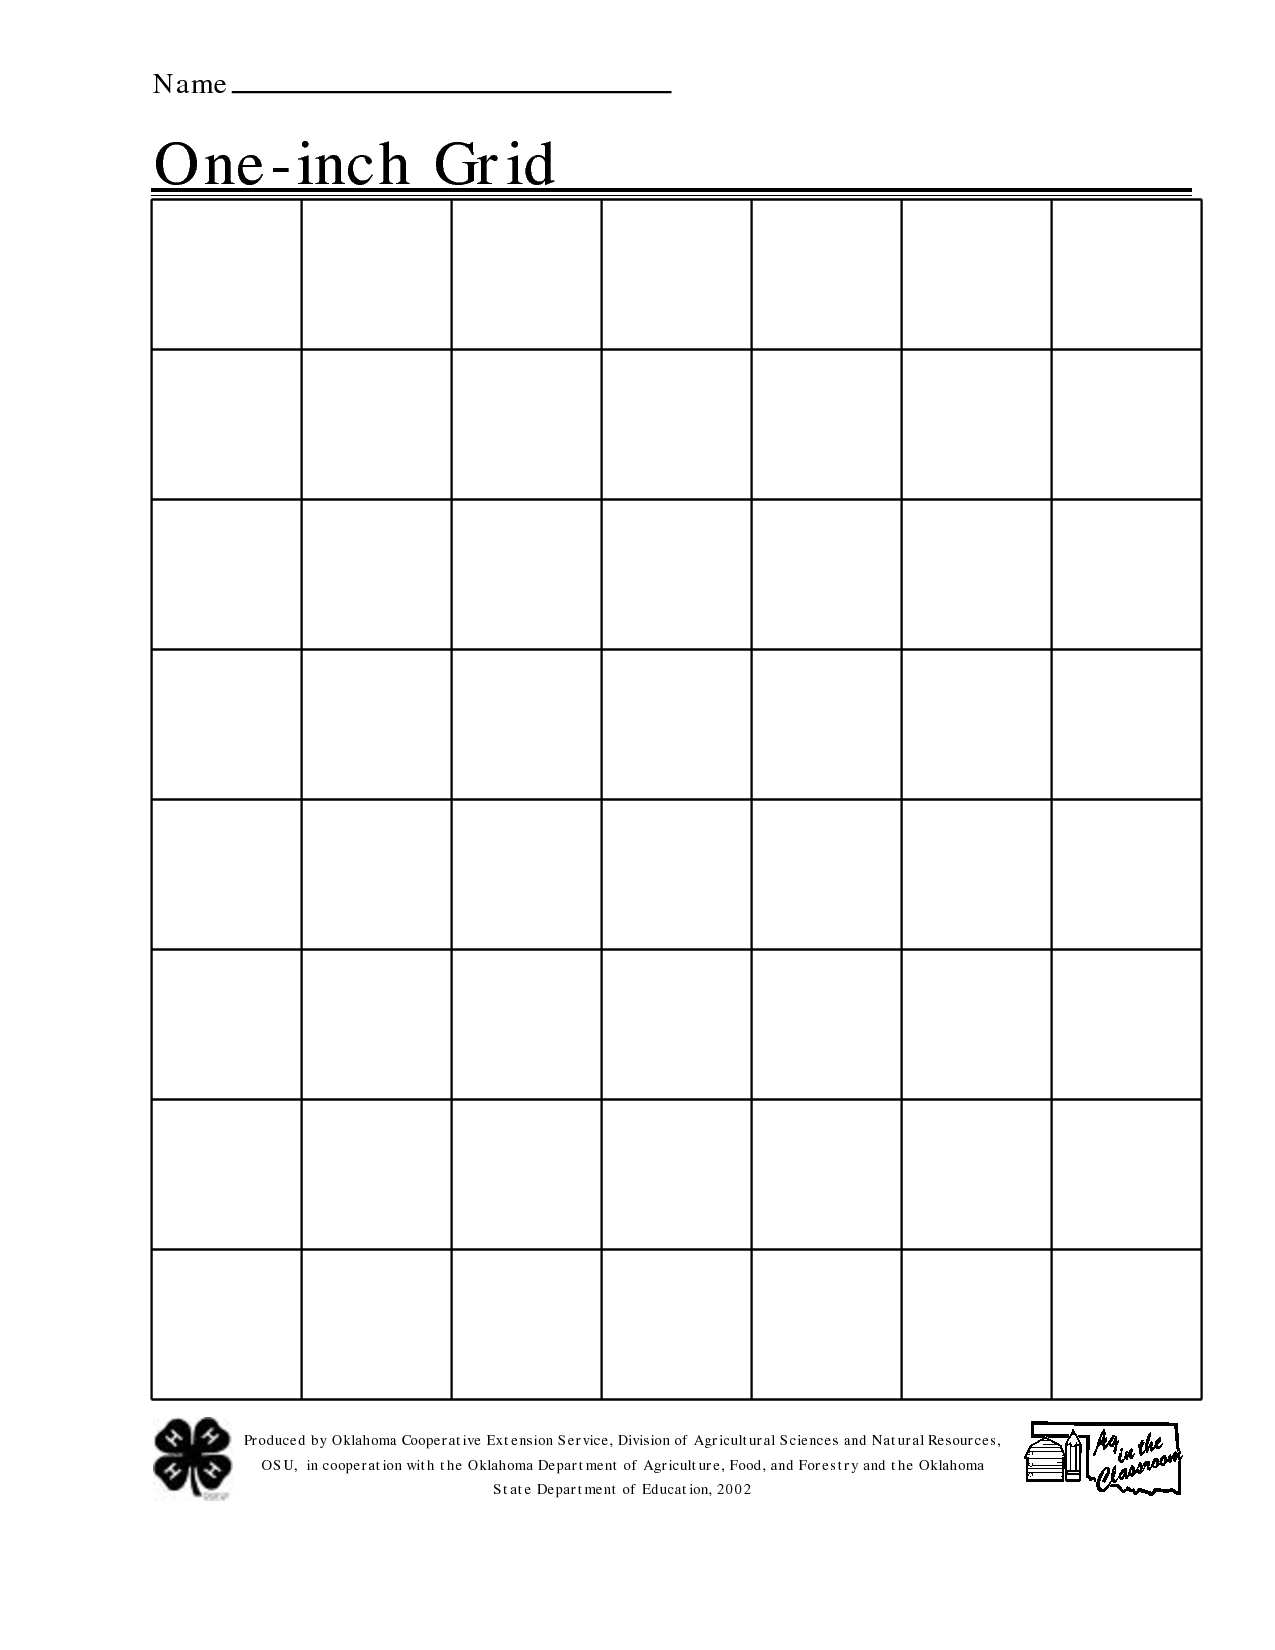 Free Printable 1 Inch Grid Paper | Math | Pinterest | Printable - Half Inch Grid Paper Free Printable